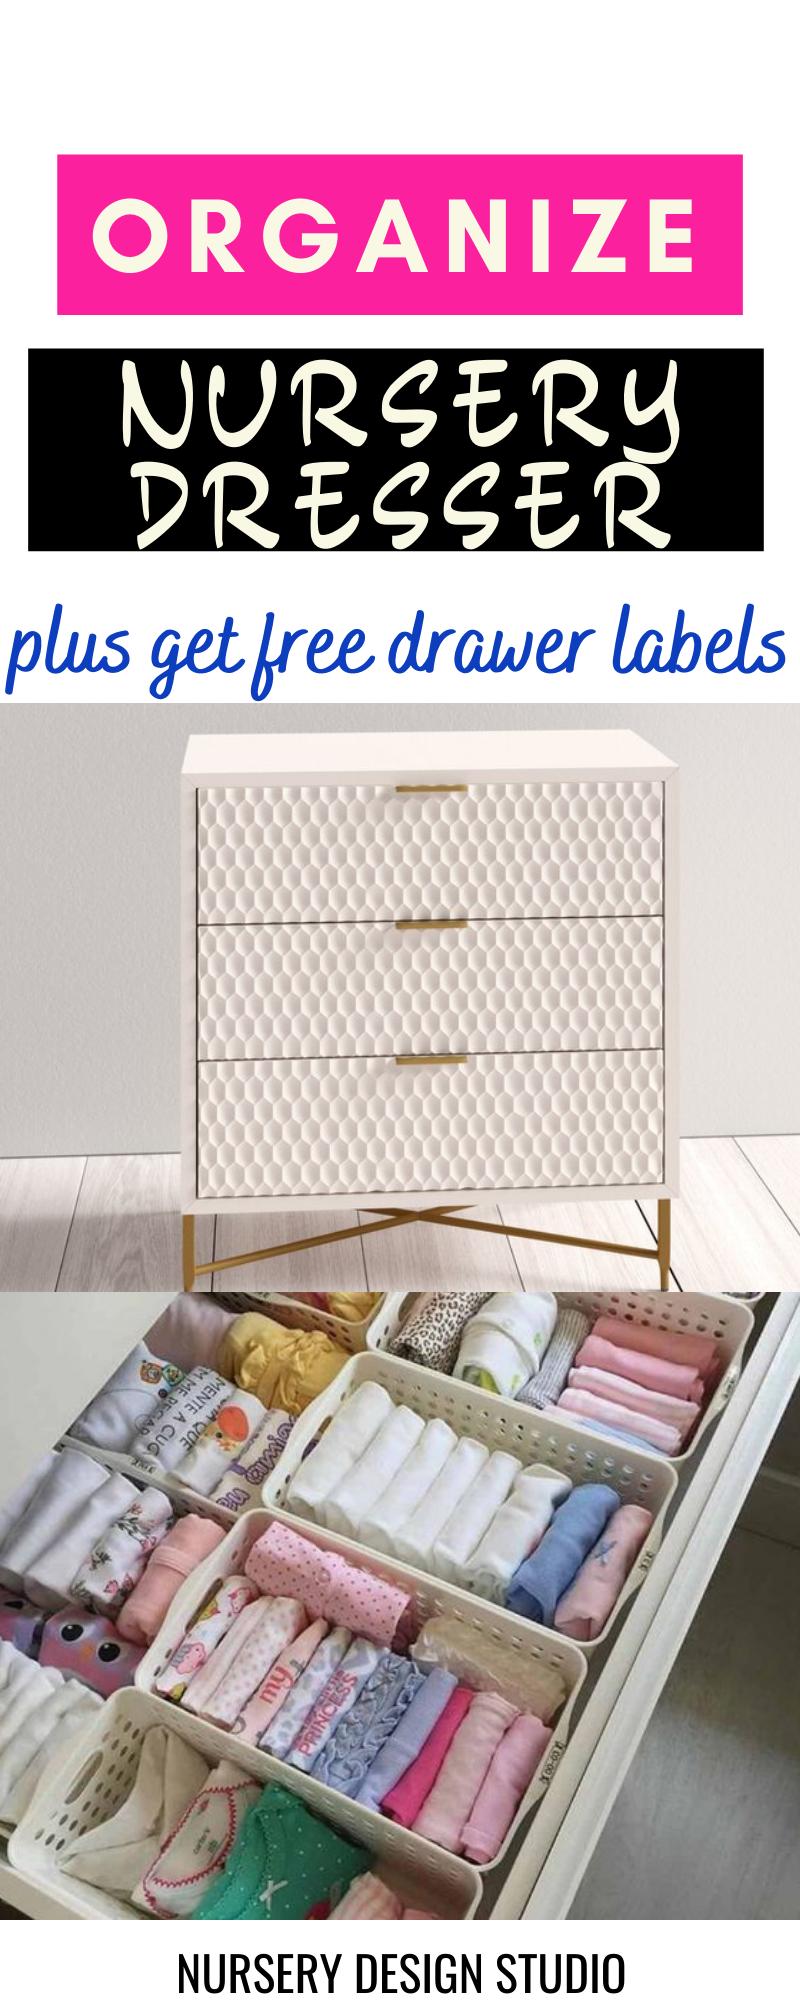 organize nursery dresser